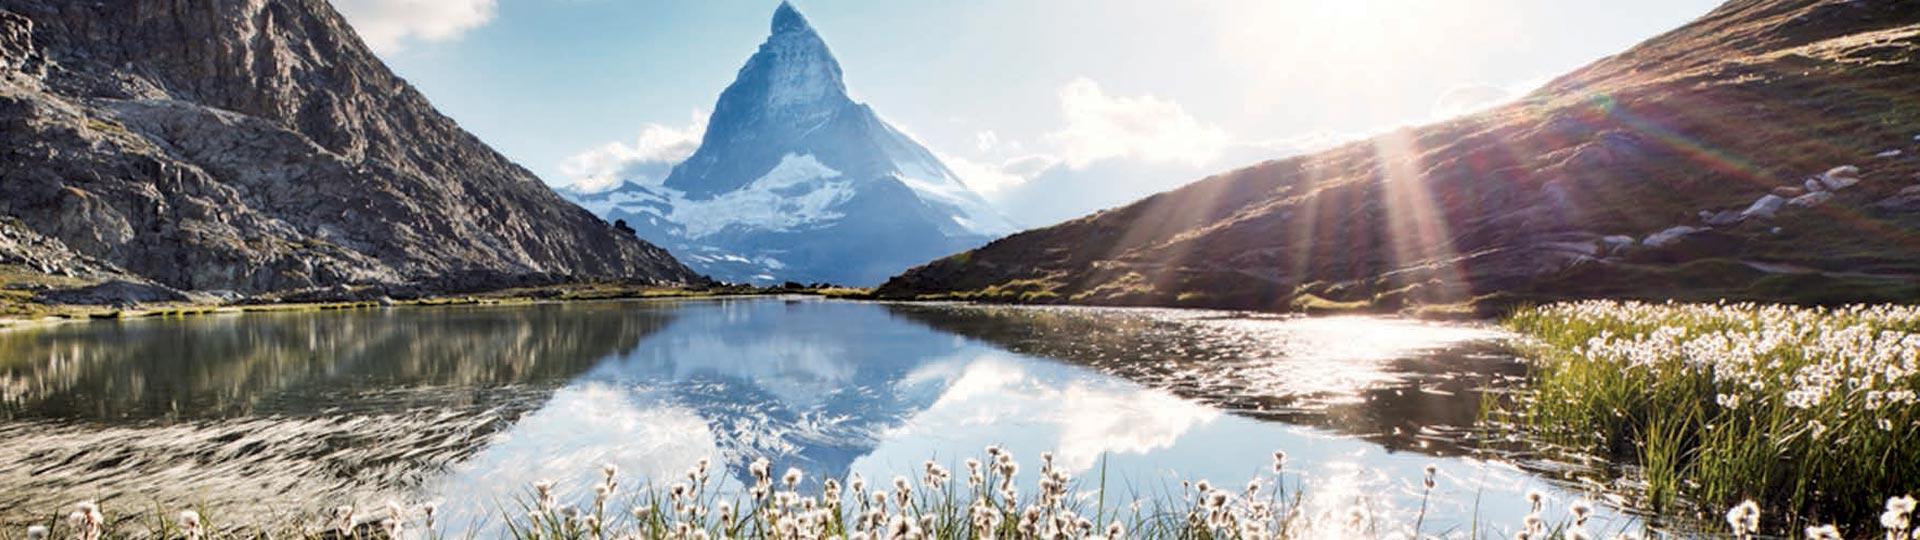 LRB Switzerland